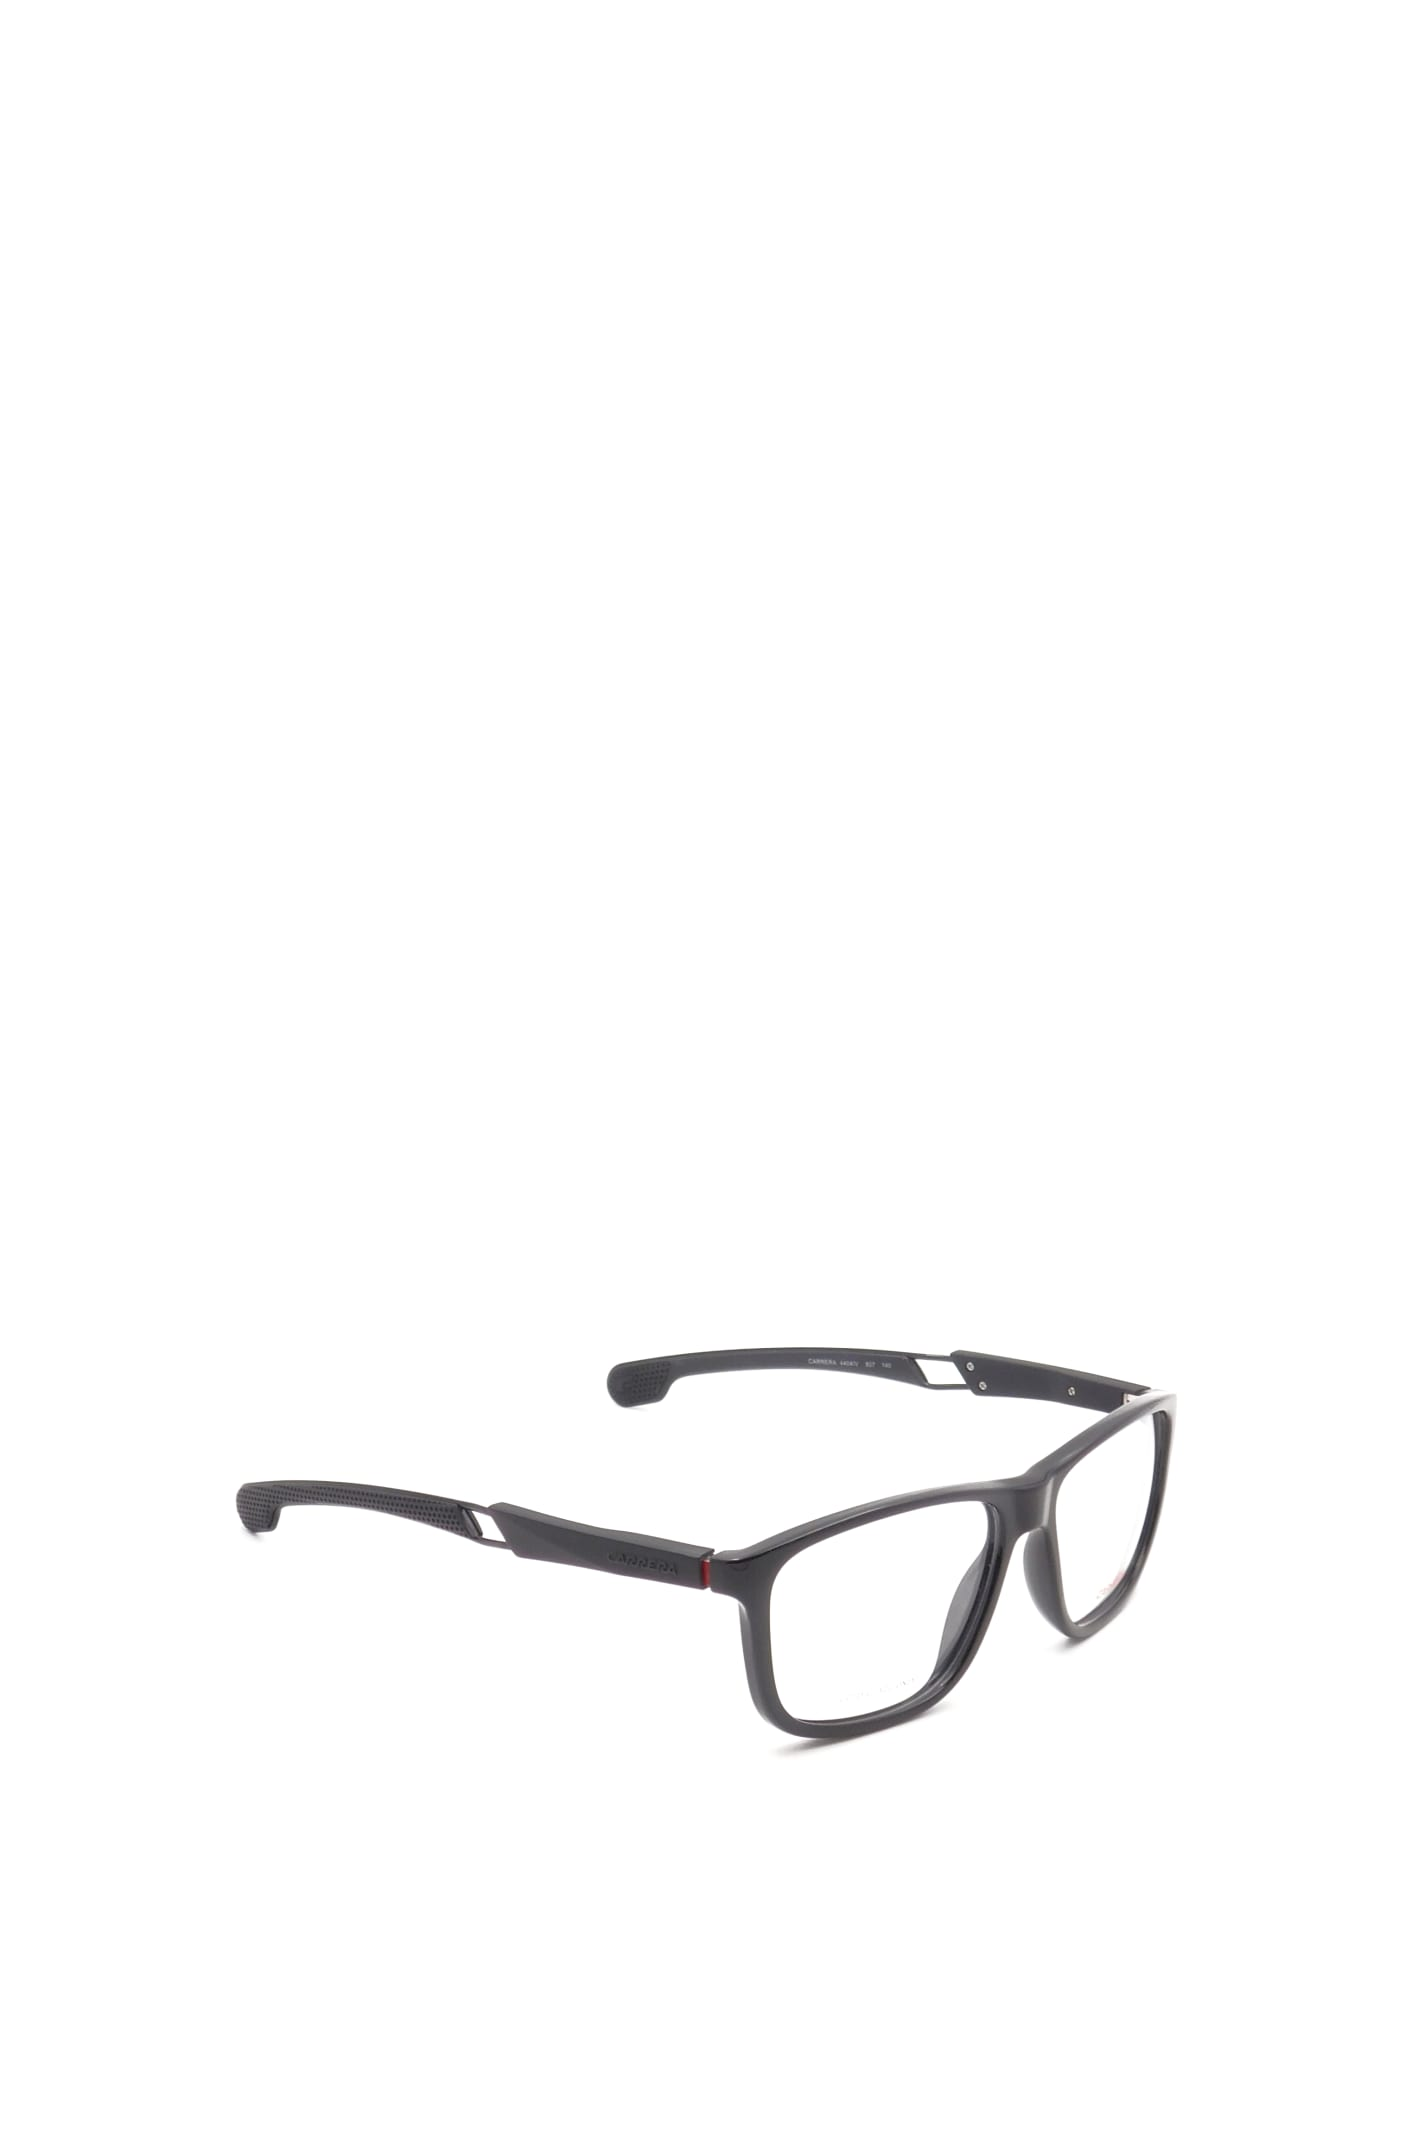 Carrera CARRERA 4404/V Eyewear